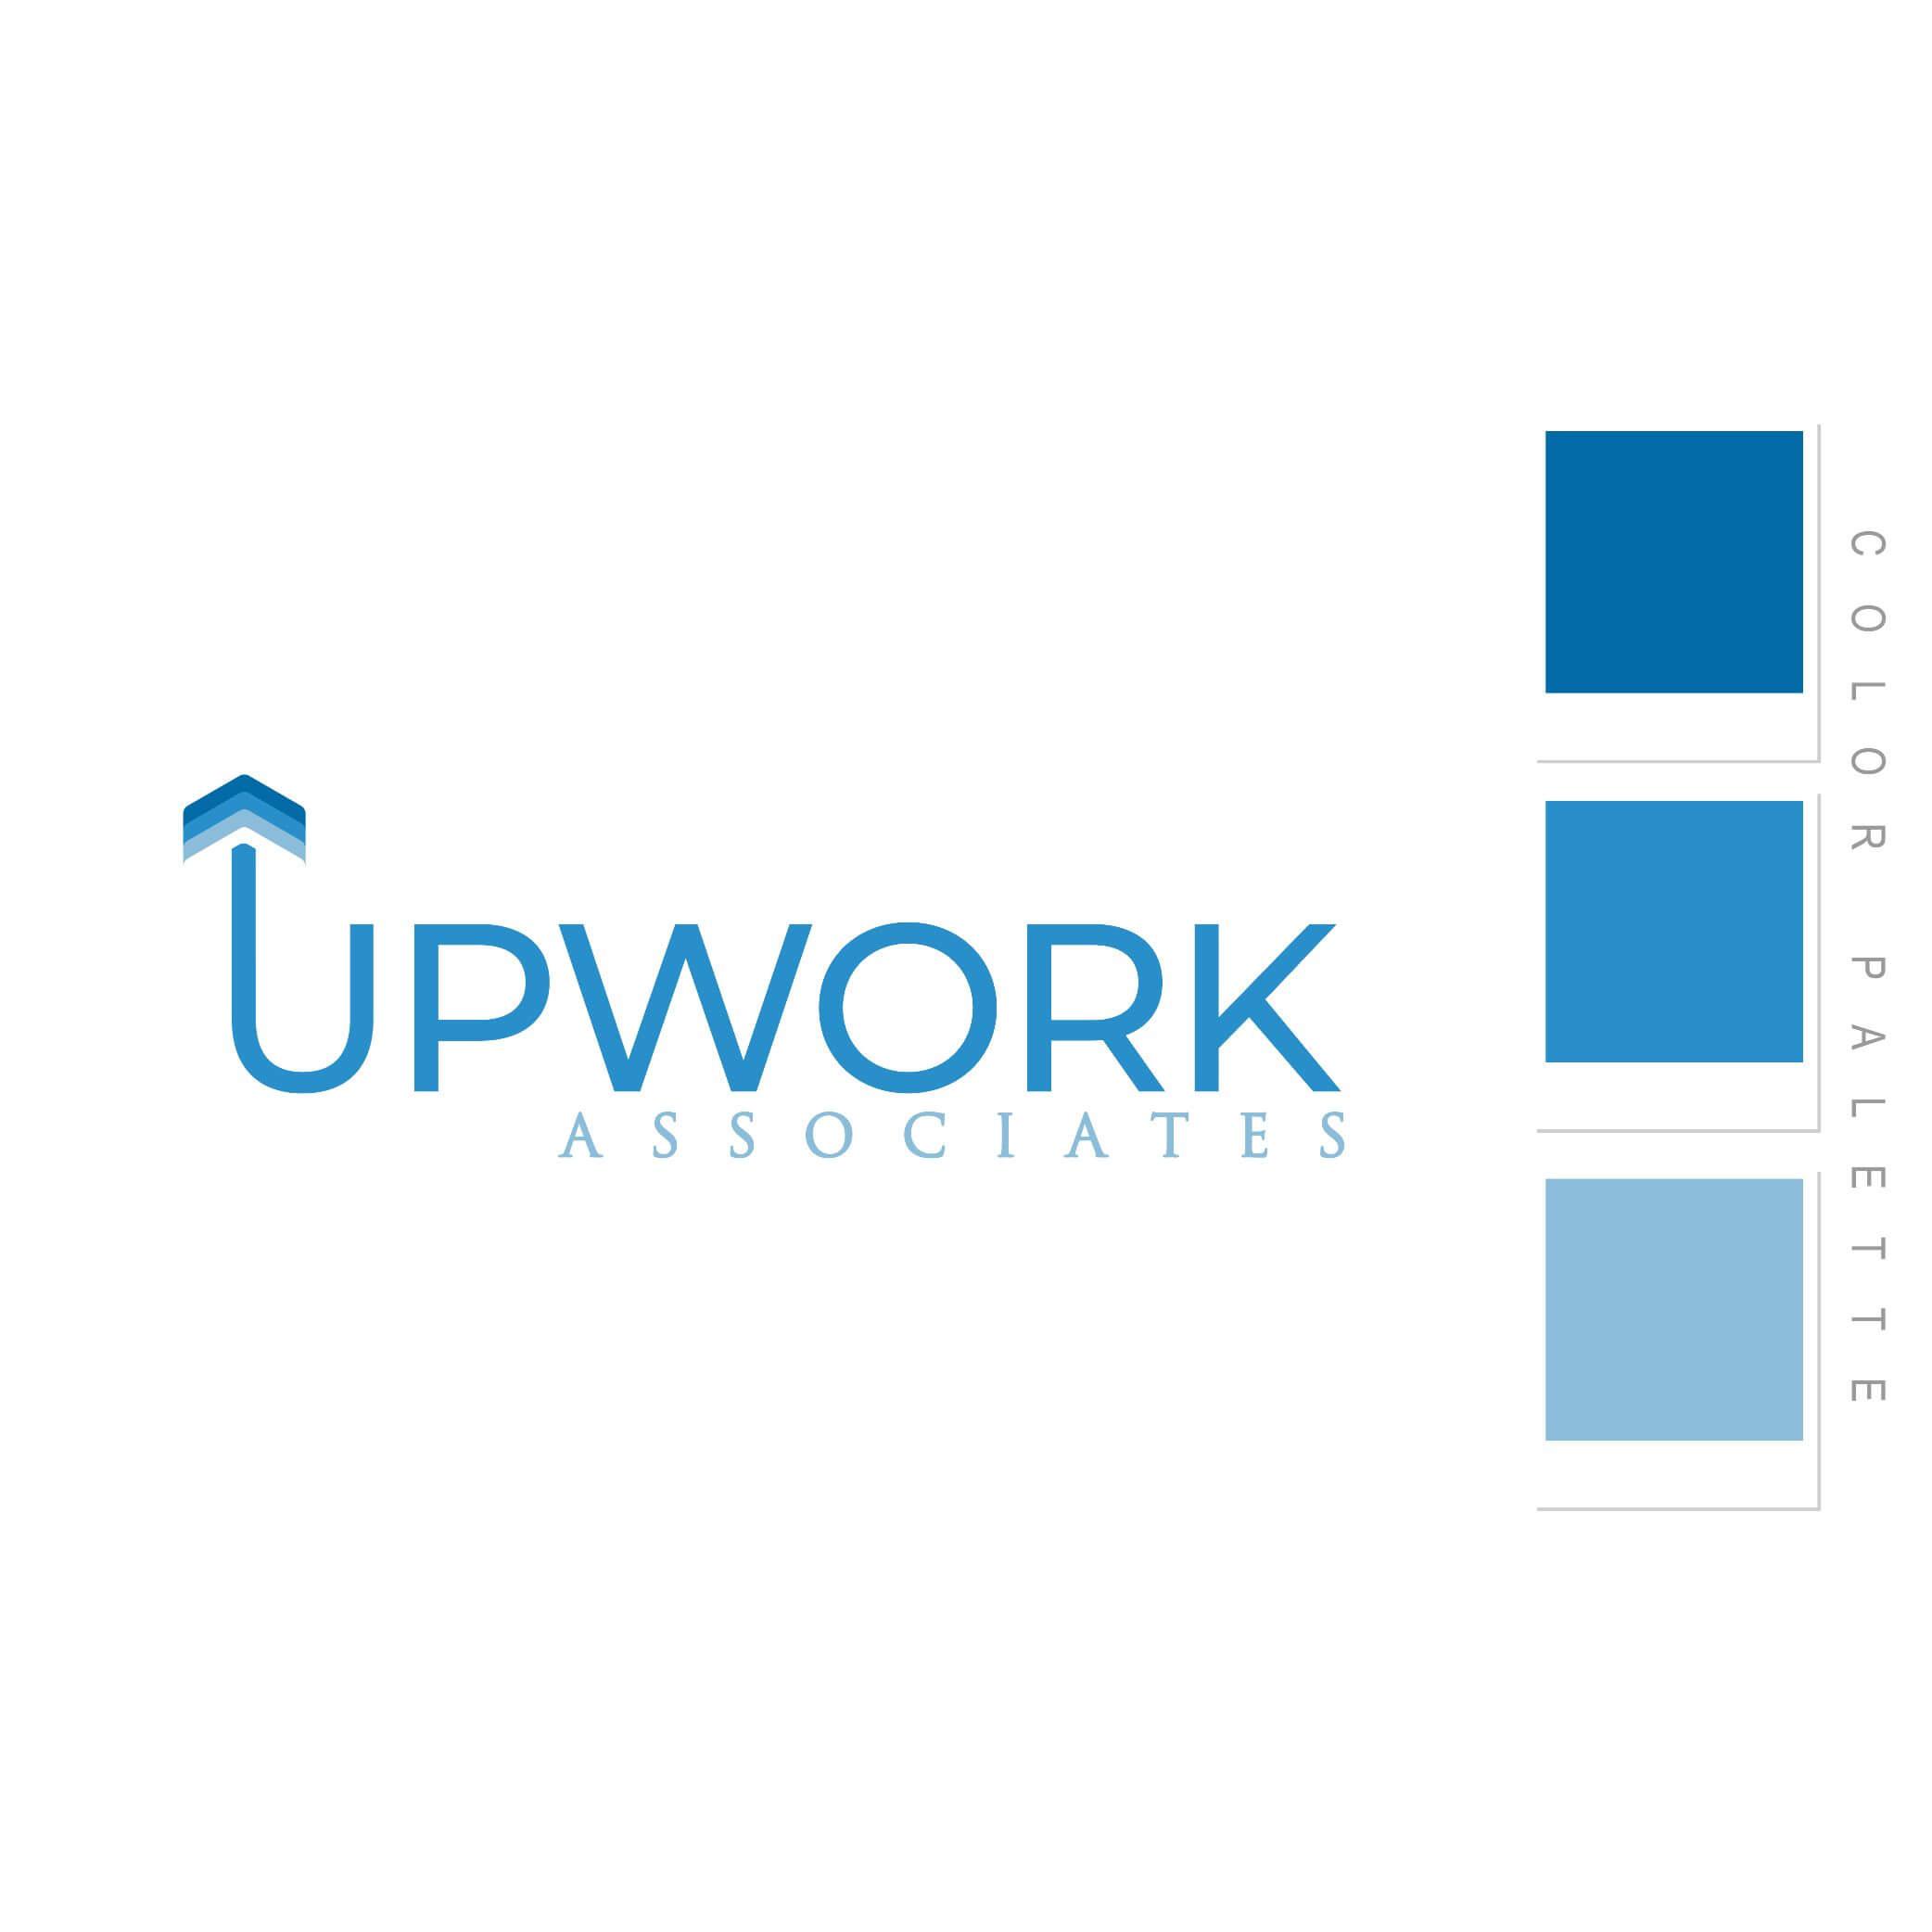 Upwork Associates Logo Design